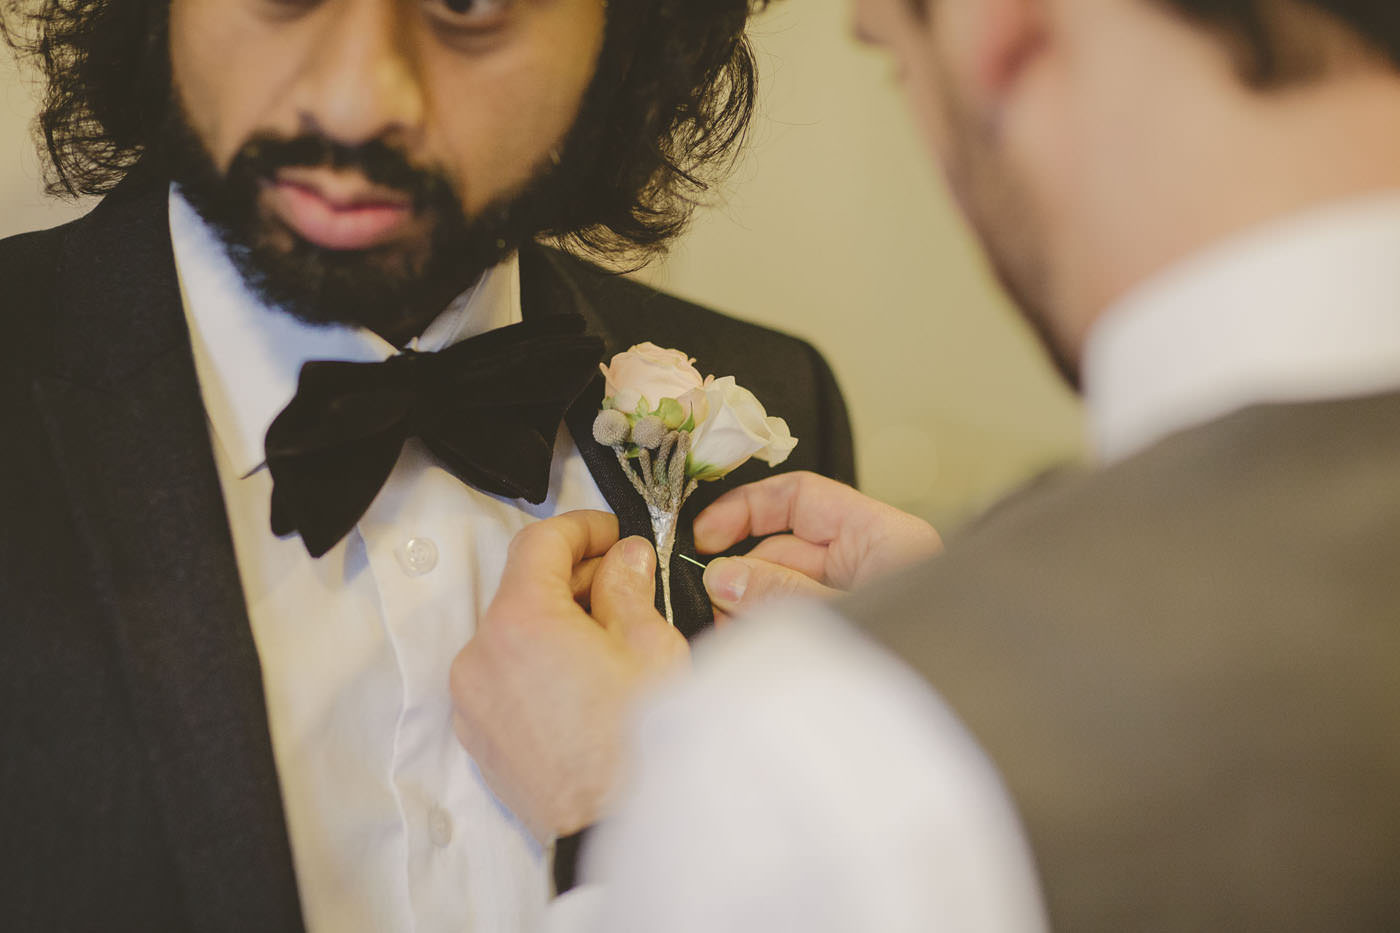 edmundjasveen burford bridge hotel wedding photographer 0010